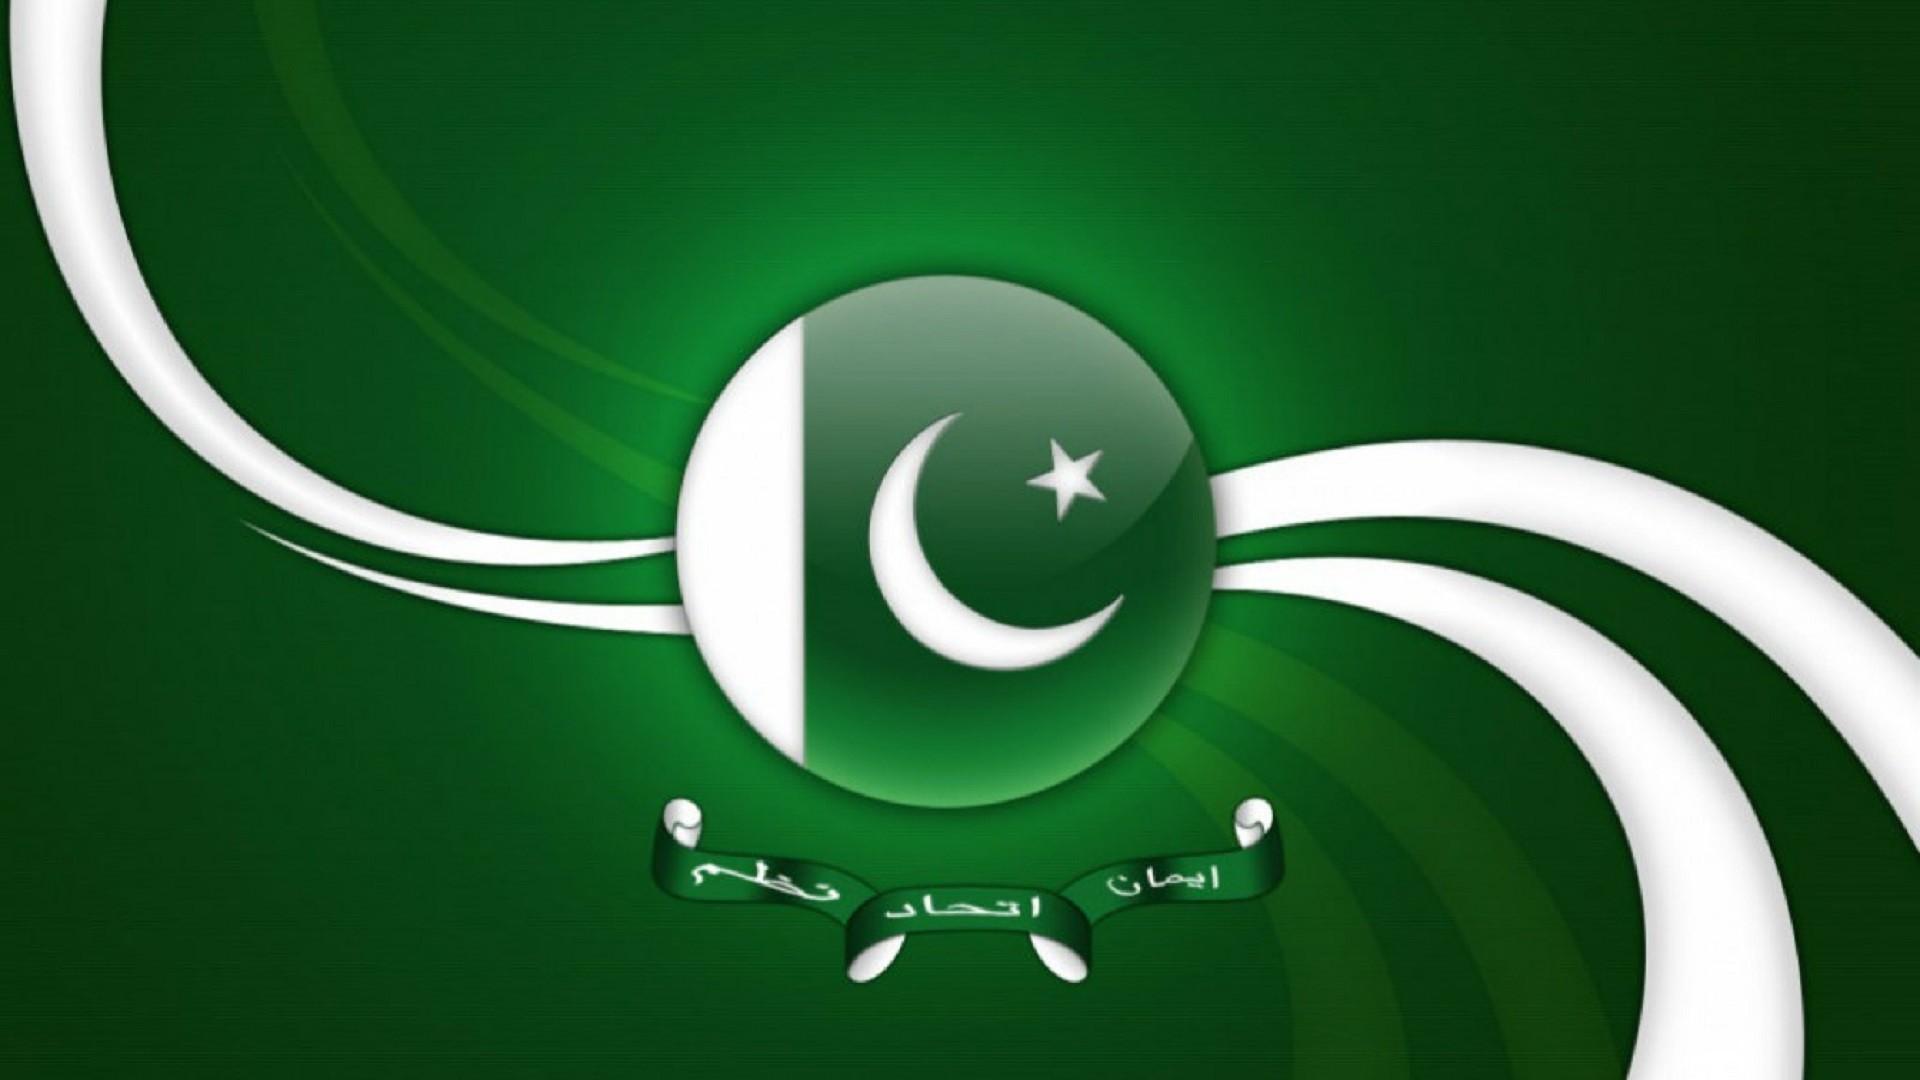 Pakistani Wallpaper 57 Images